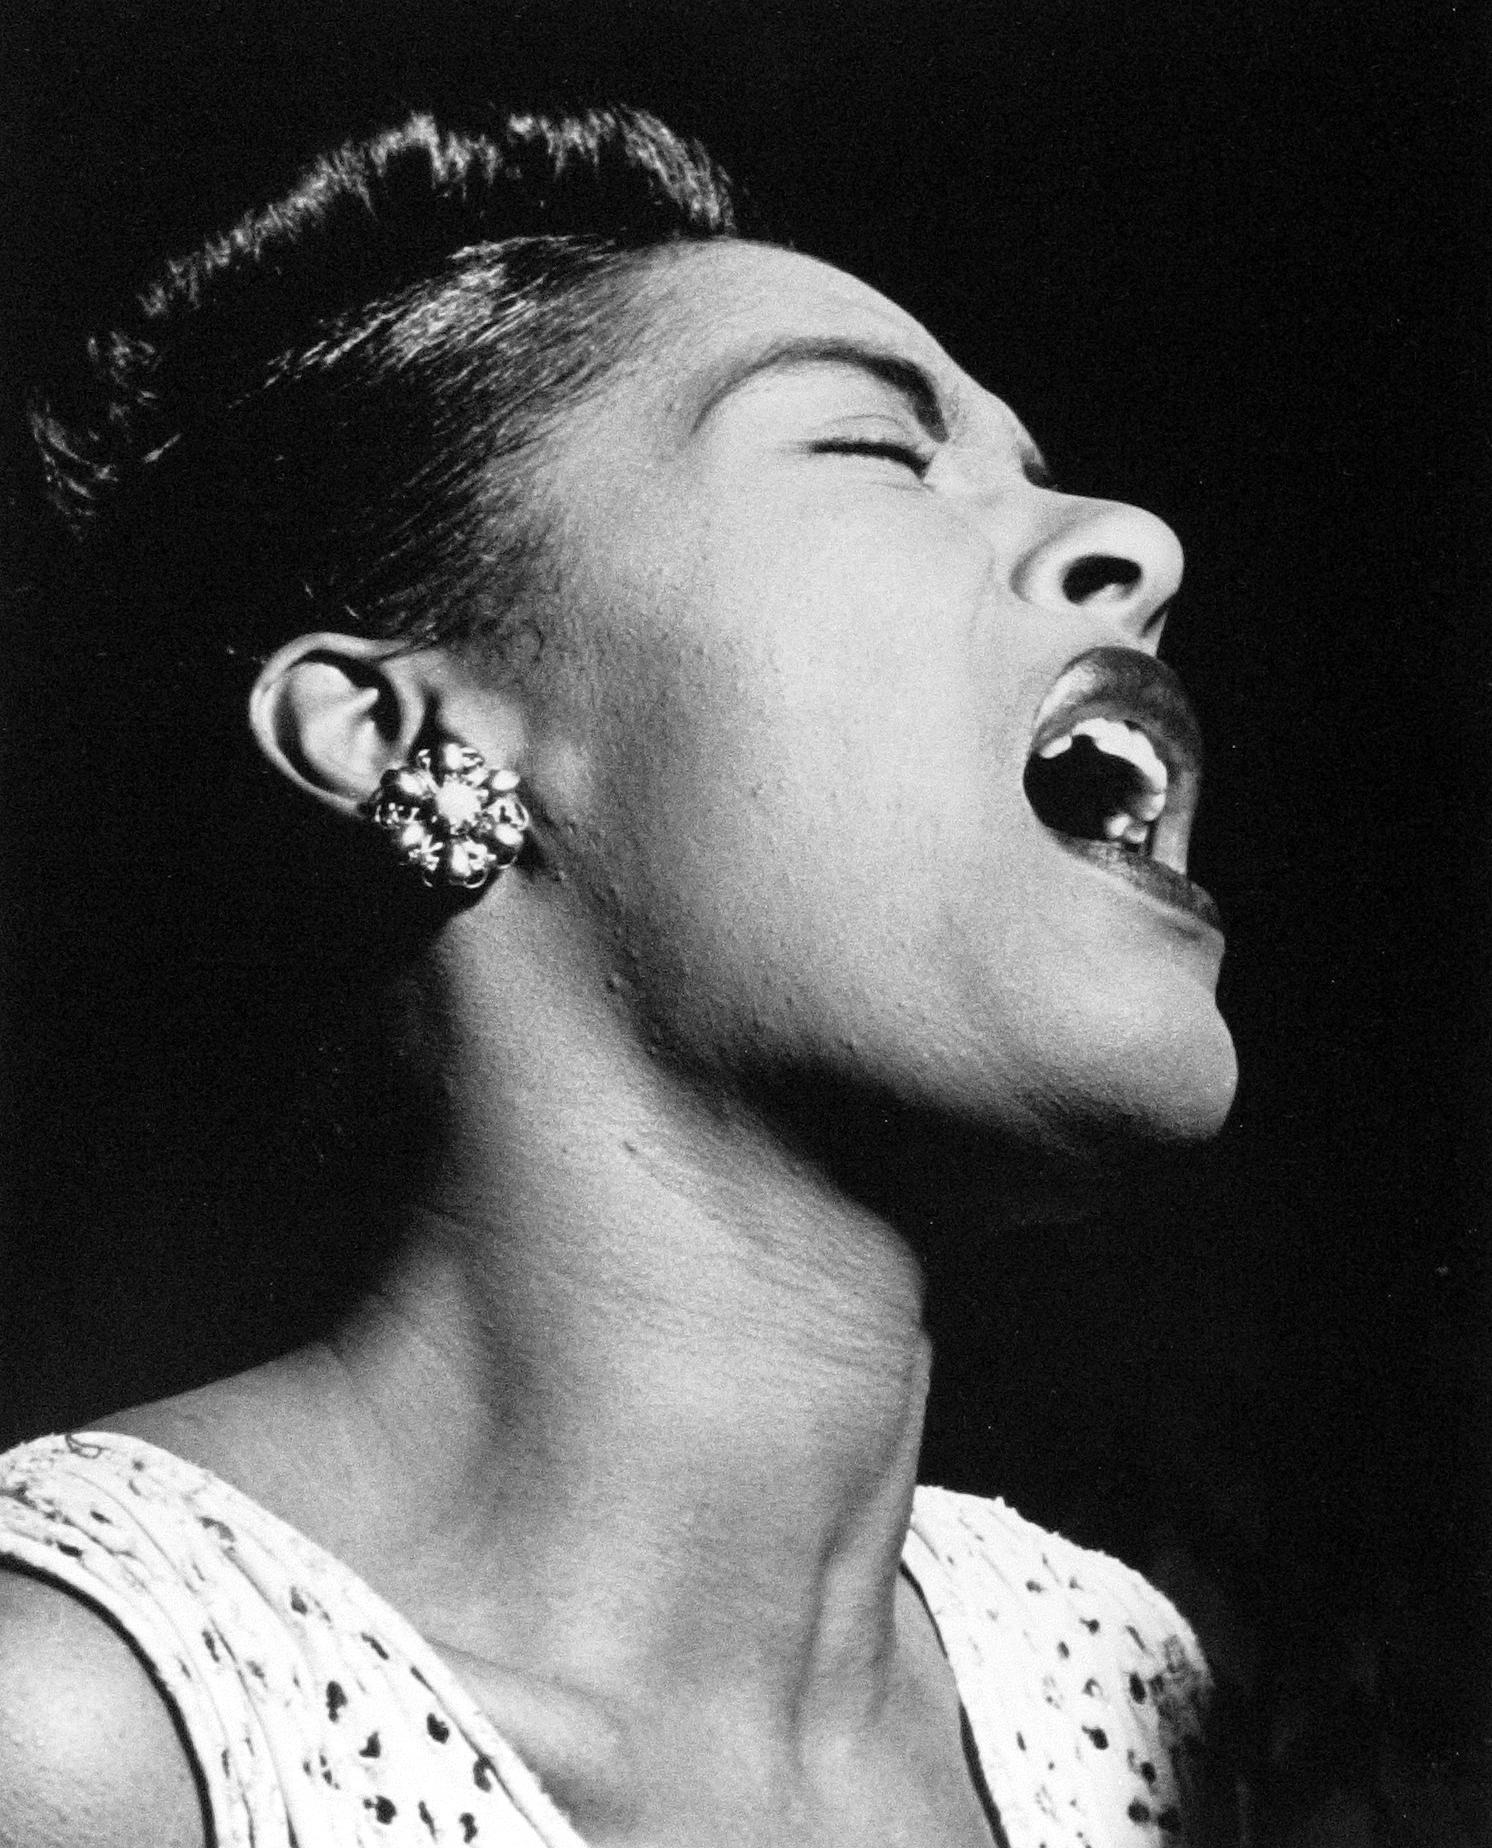 William P. Gottlieb, Billie Holiday, c.1947, courtesy of the estate of William P. Gottlieb